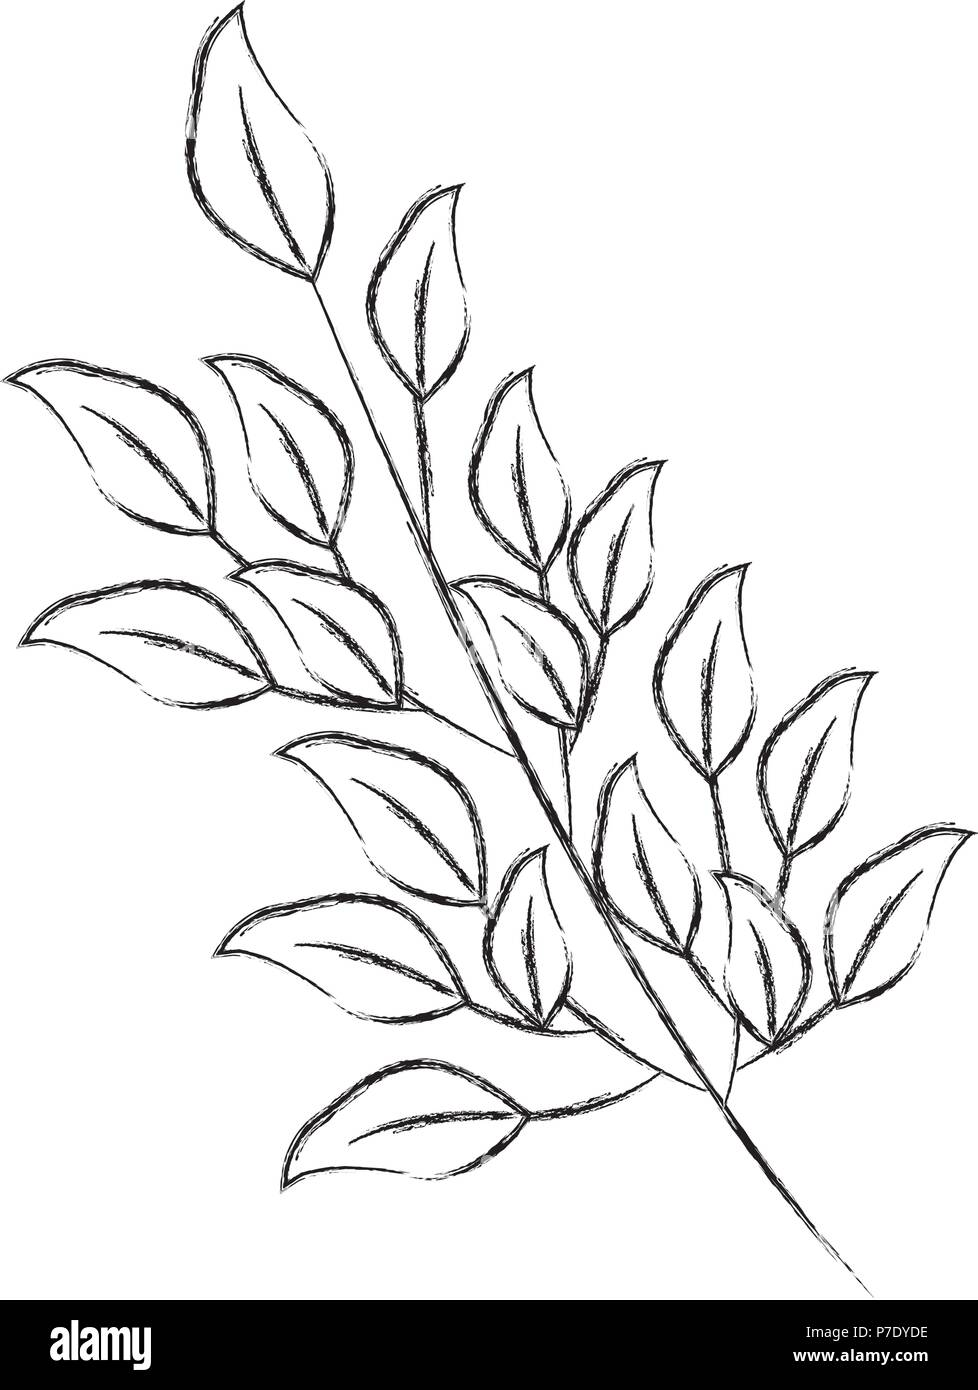 branch foliage leaves natural botanical vector illustration vector illustration sketch - Stock Image